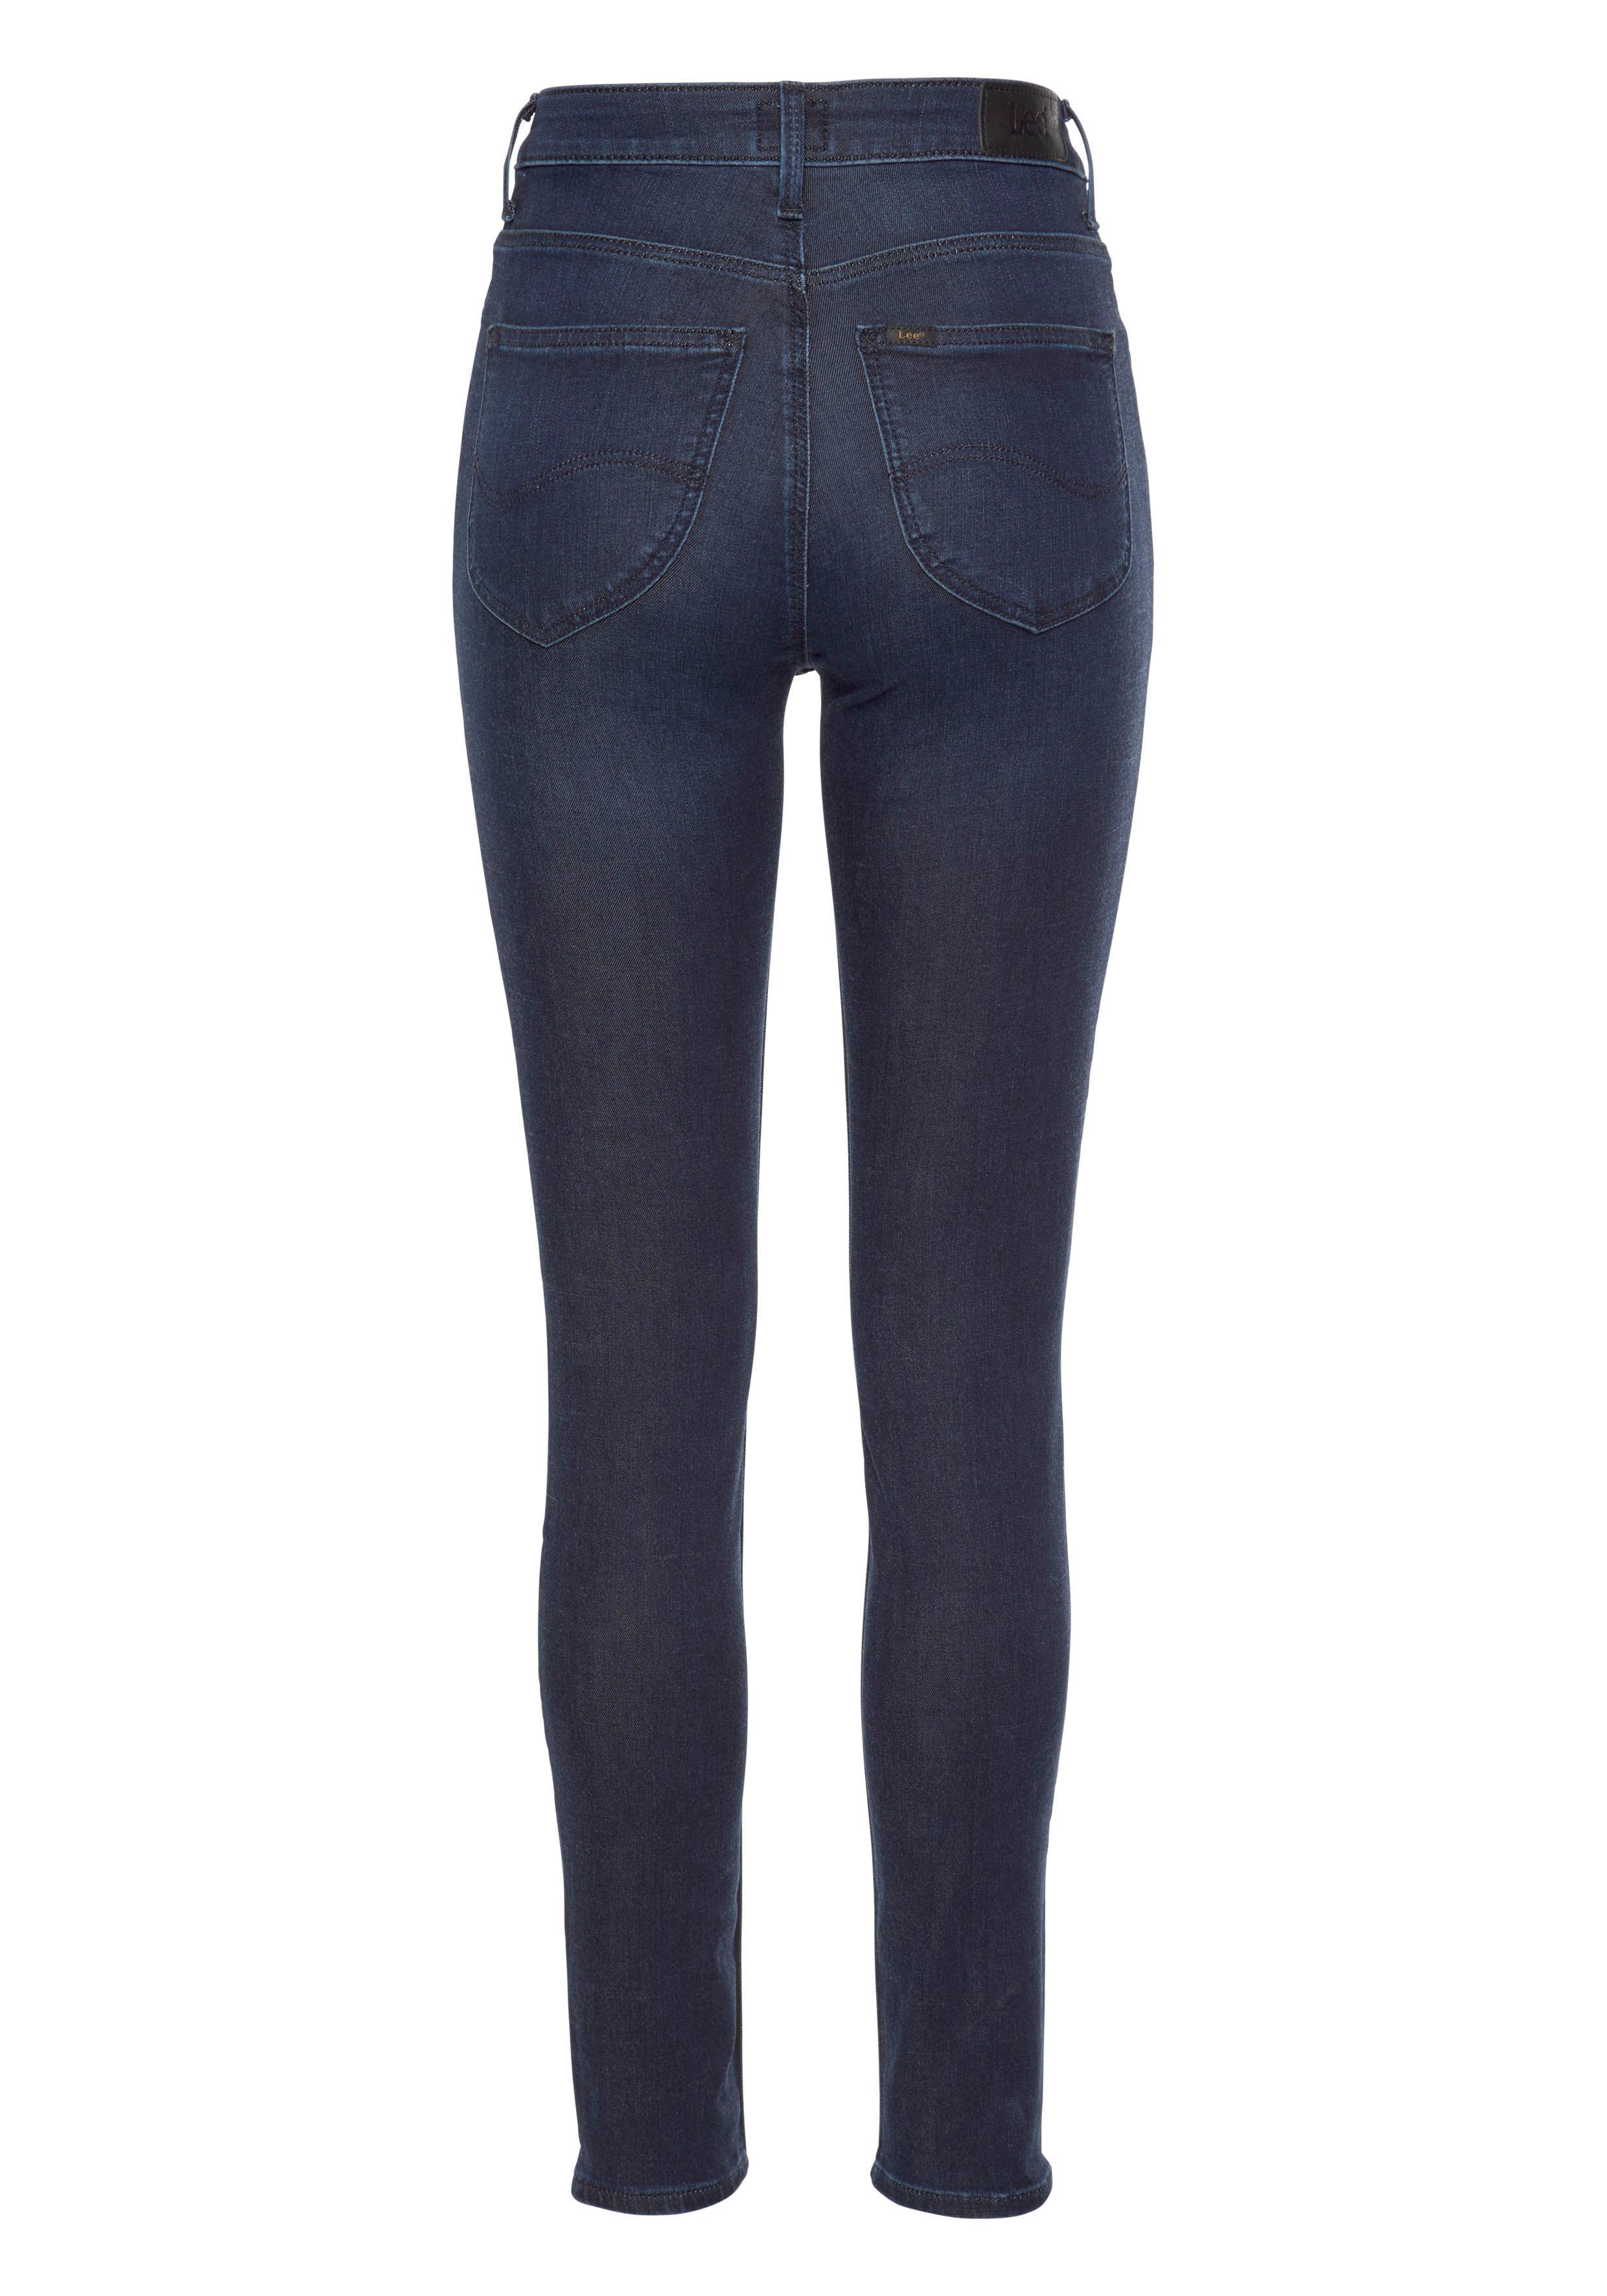 Lee High-waist-Jeans Scarlett   Bekleidung > Jeans > High Waist Jeans   Lee